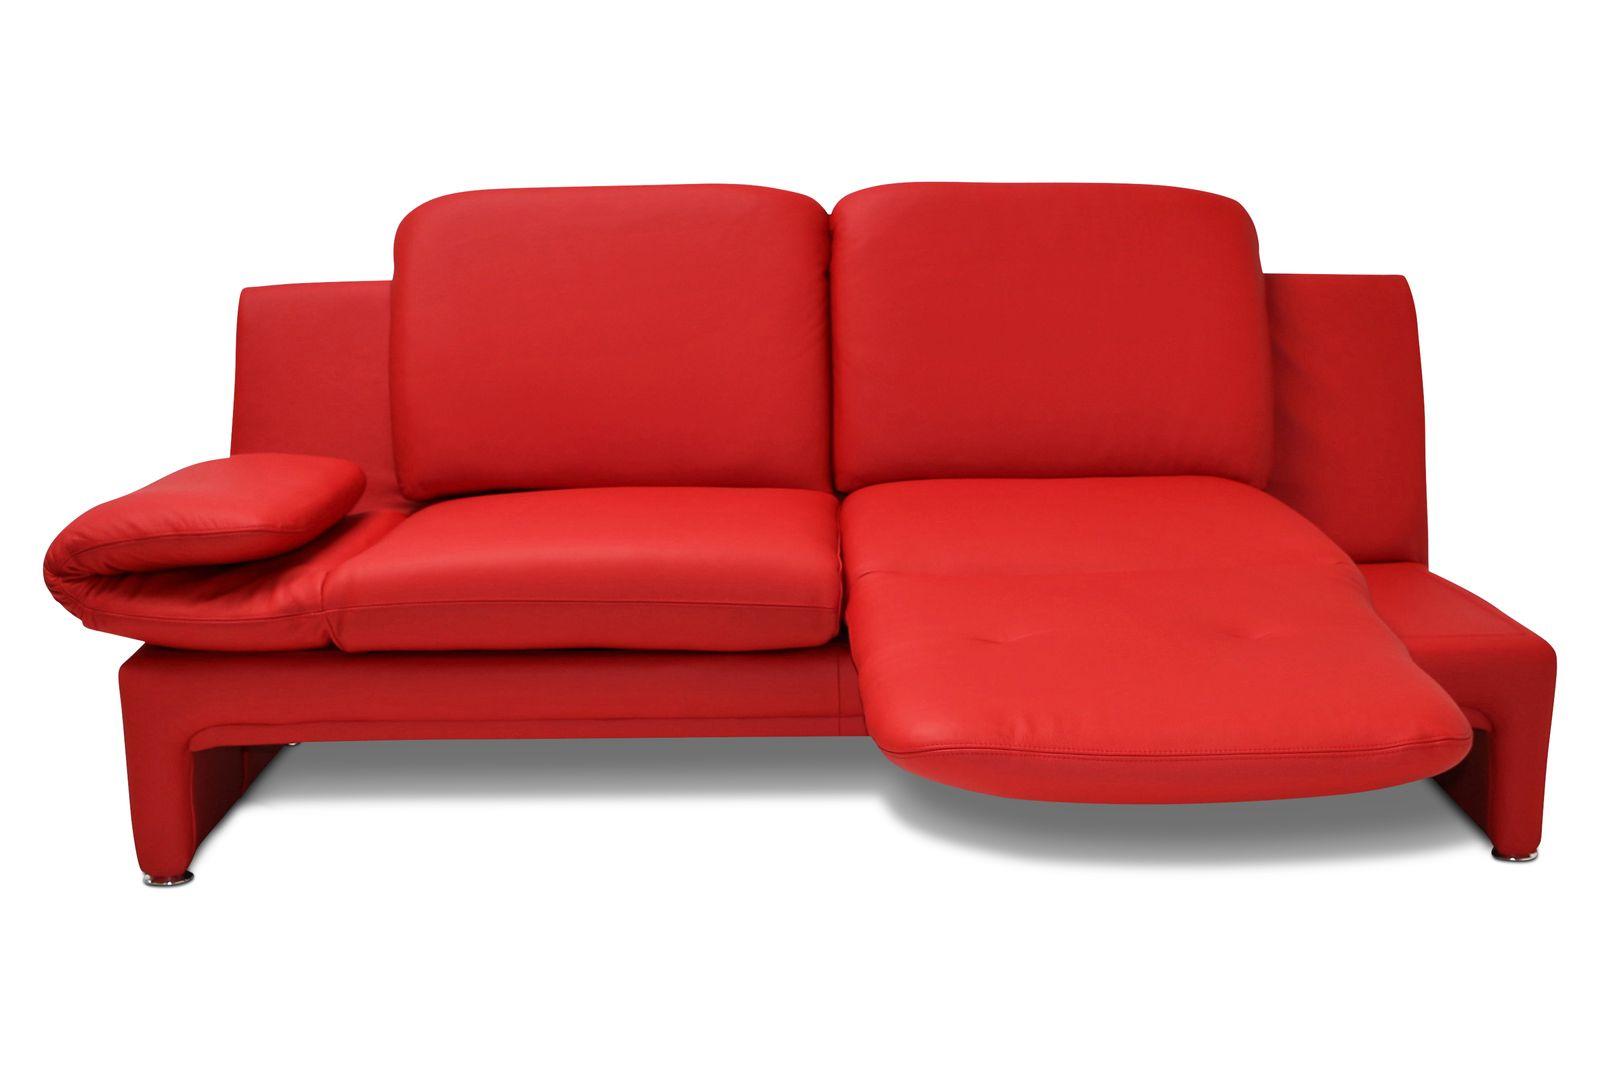 Ledersofa Vibe 2,5-Sitzer Relax-Drehsitz